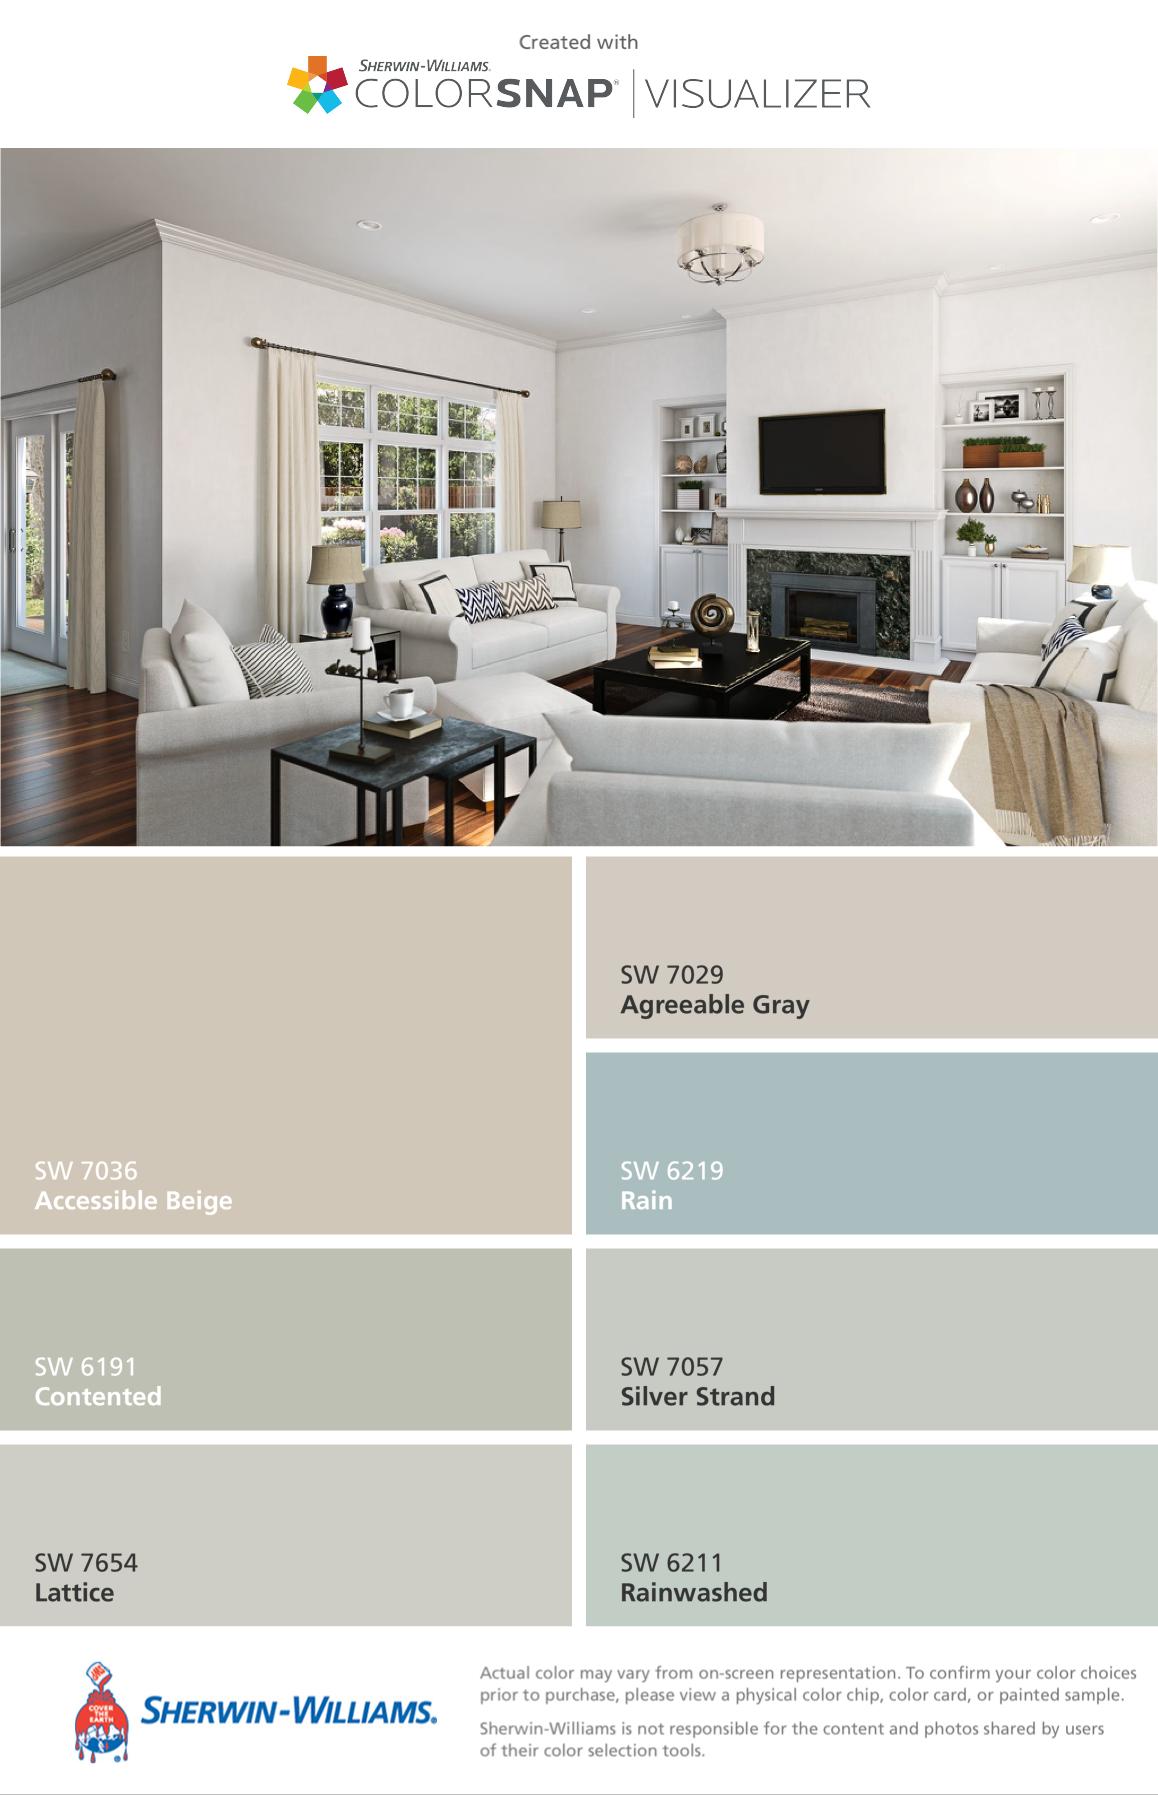 Pin By Amanda Ayasi On Home Decor Paint Colors For Living Room Room Paint Colors Living Room Colors